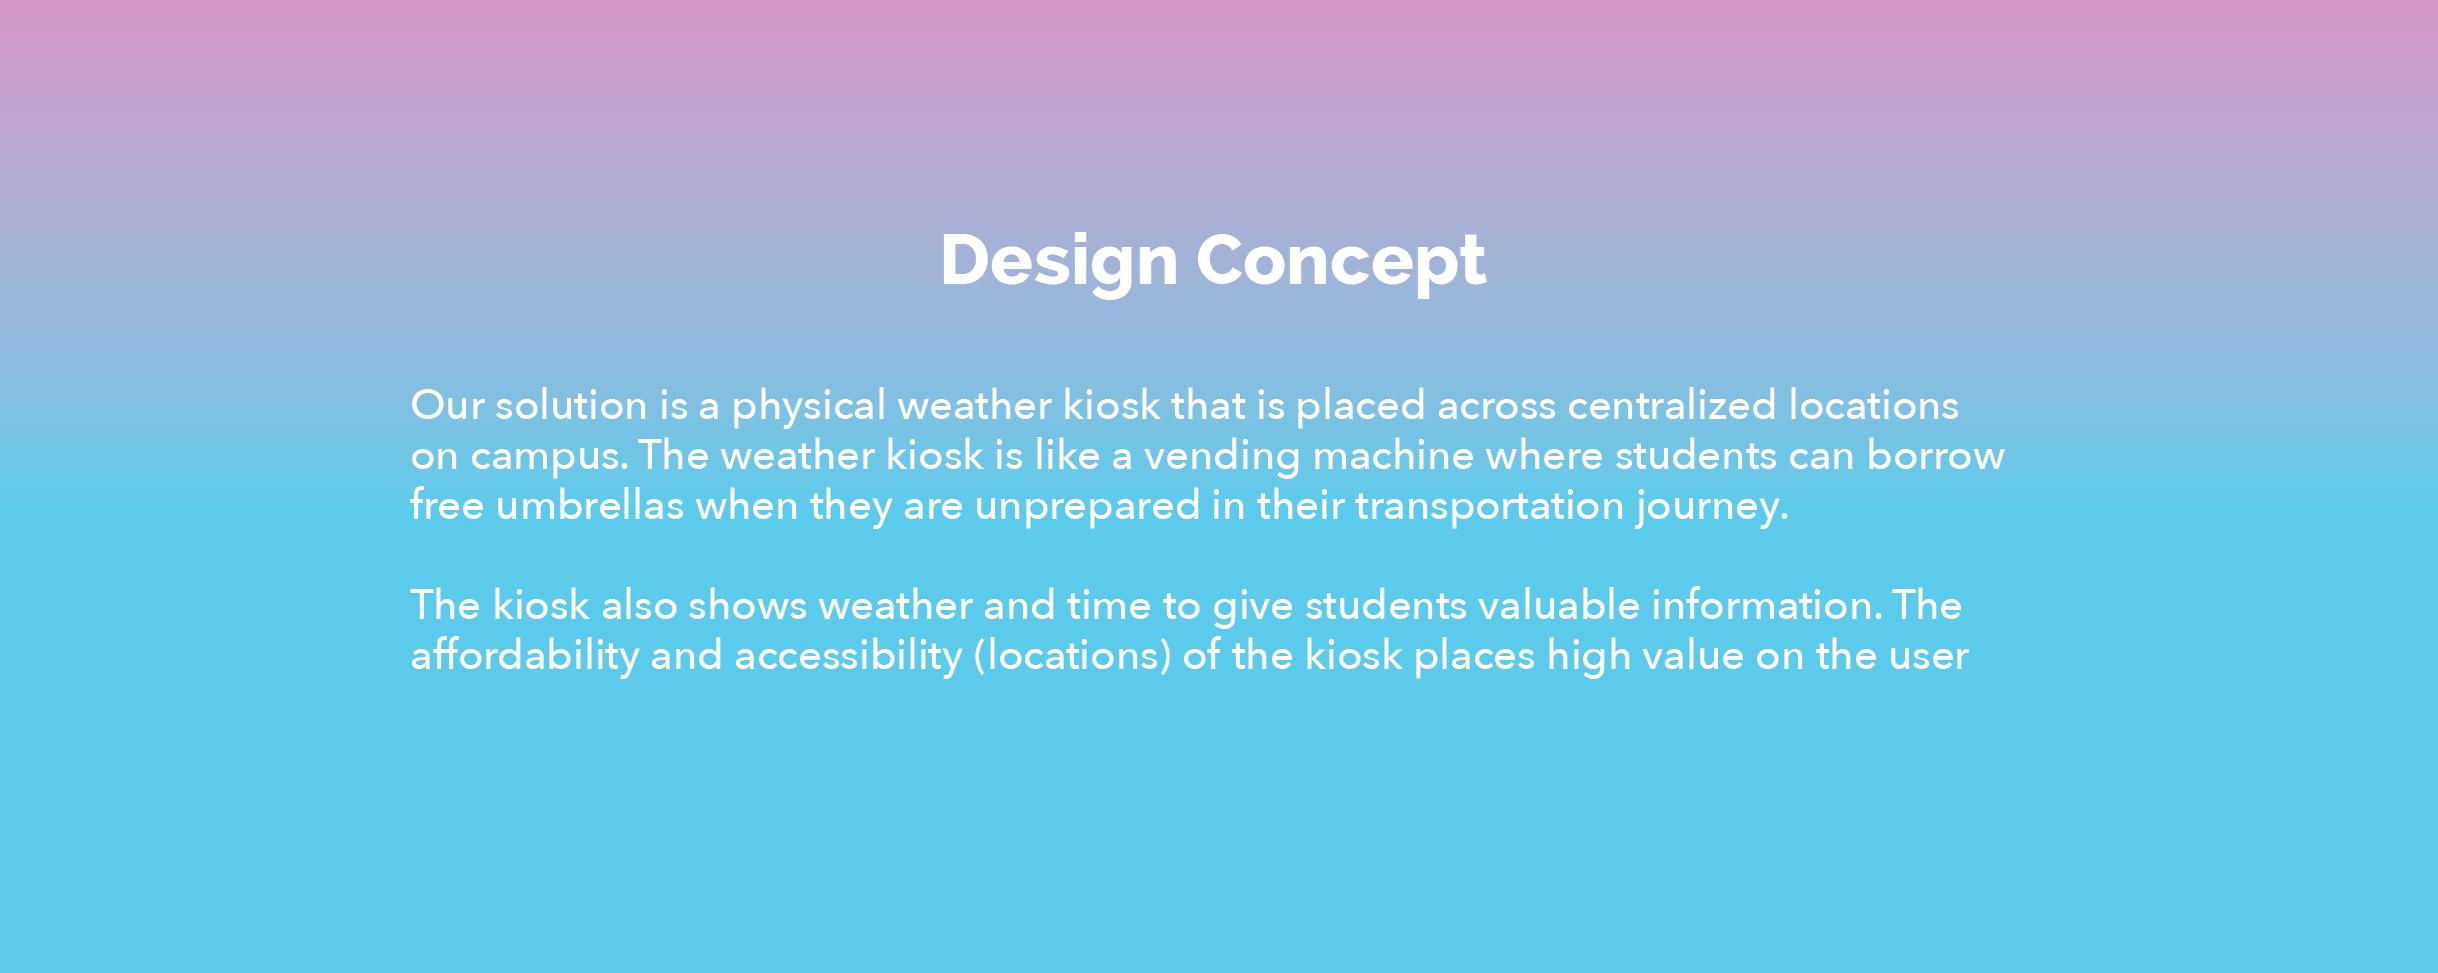 design concept_1.png